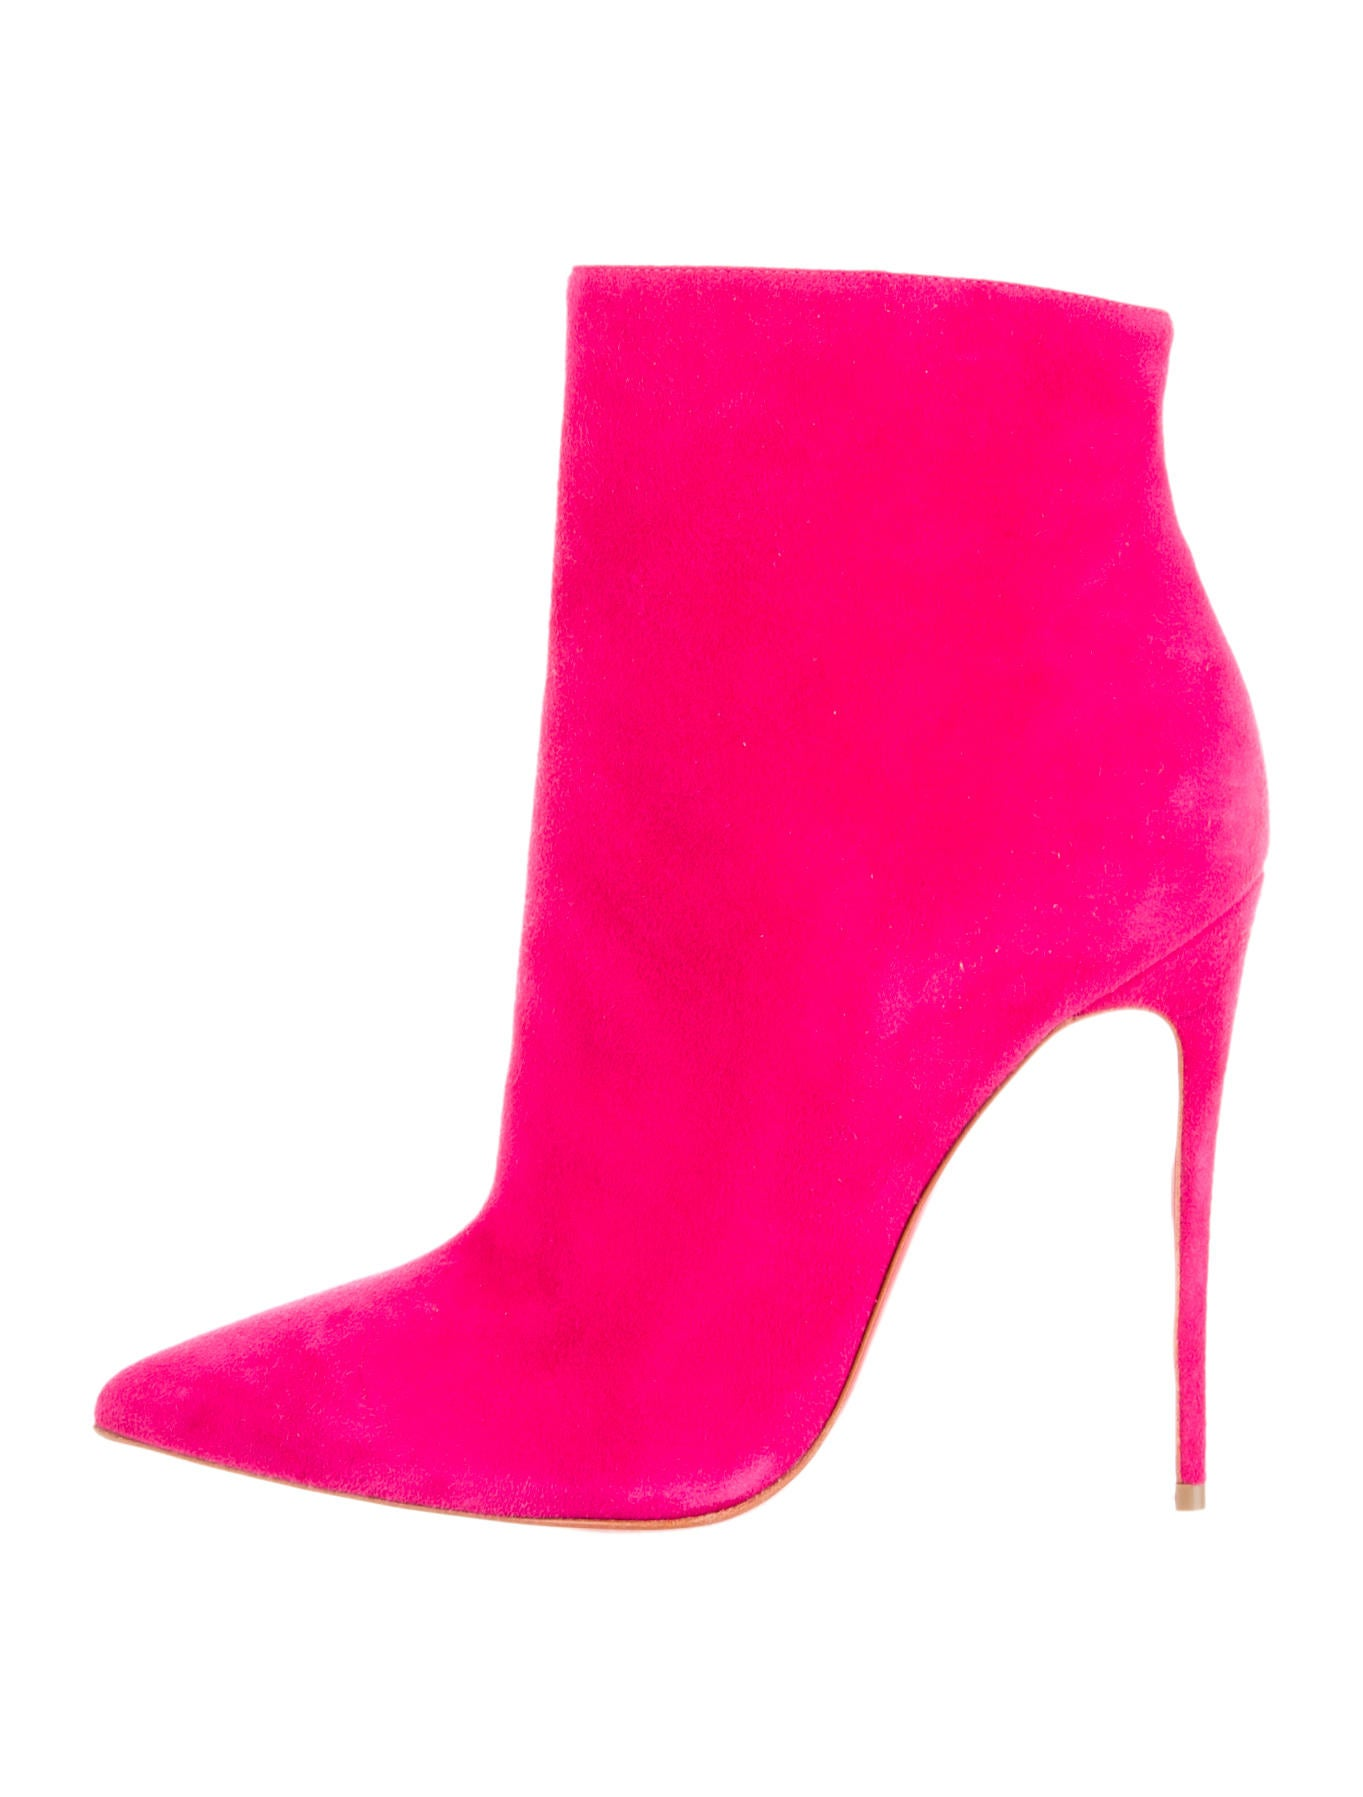 best website ea598 f8519 Artesur » christian louboutin ankle booties Pink suede ...